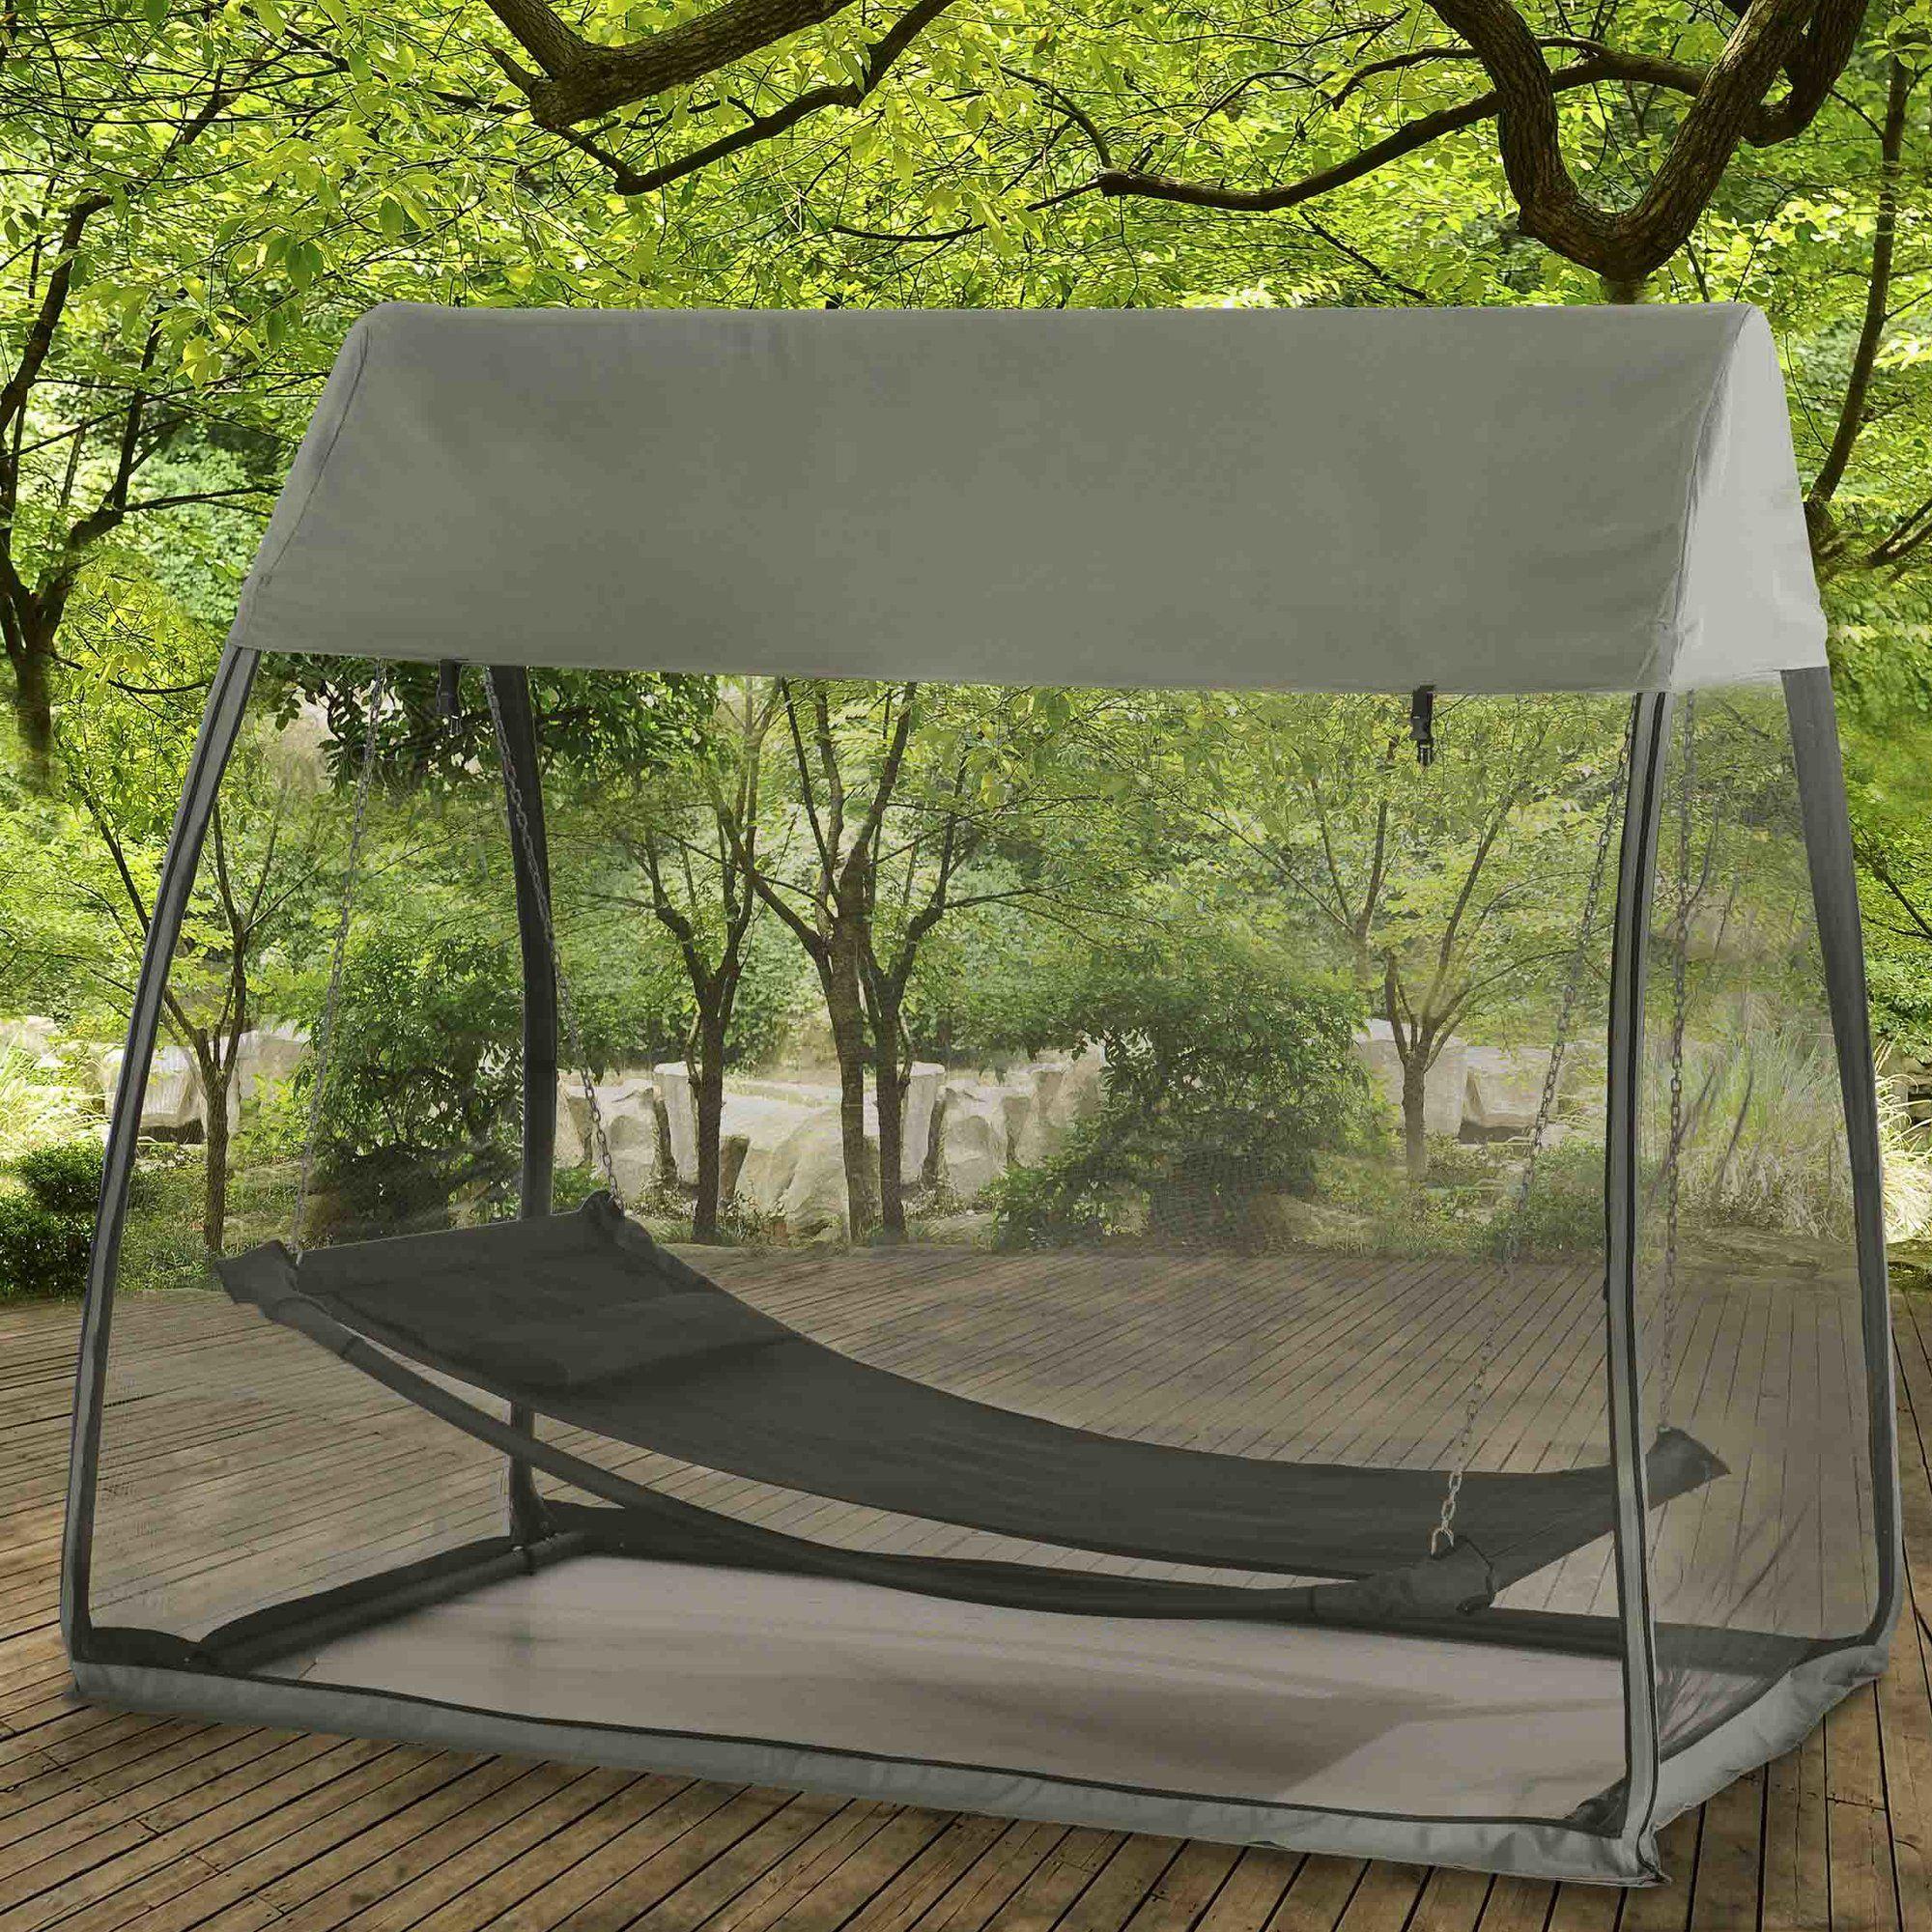 Braes Tented Camping Hammock Hammock tent, Backyard